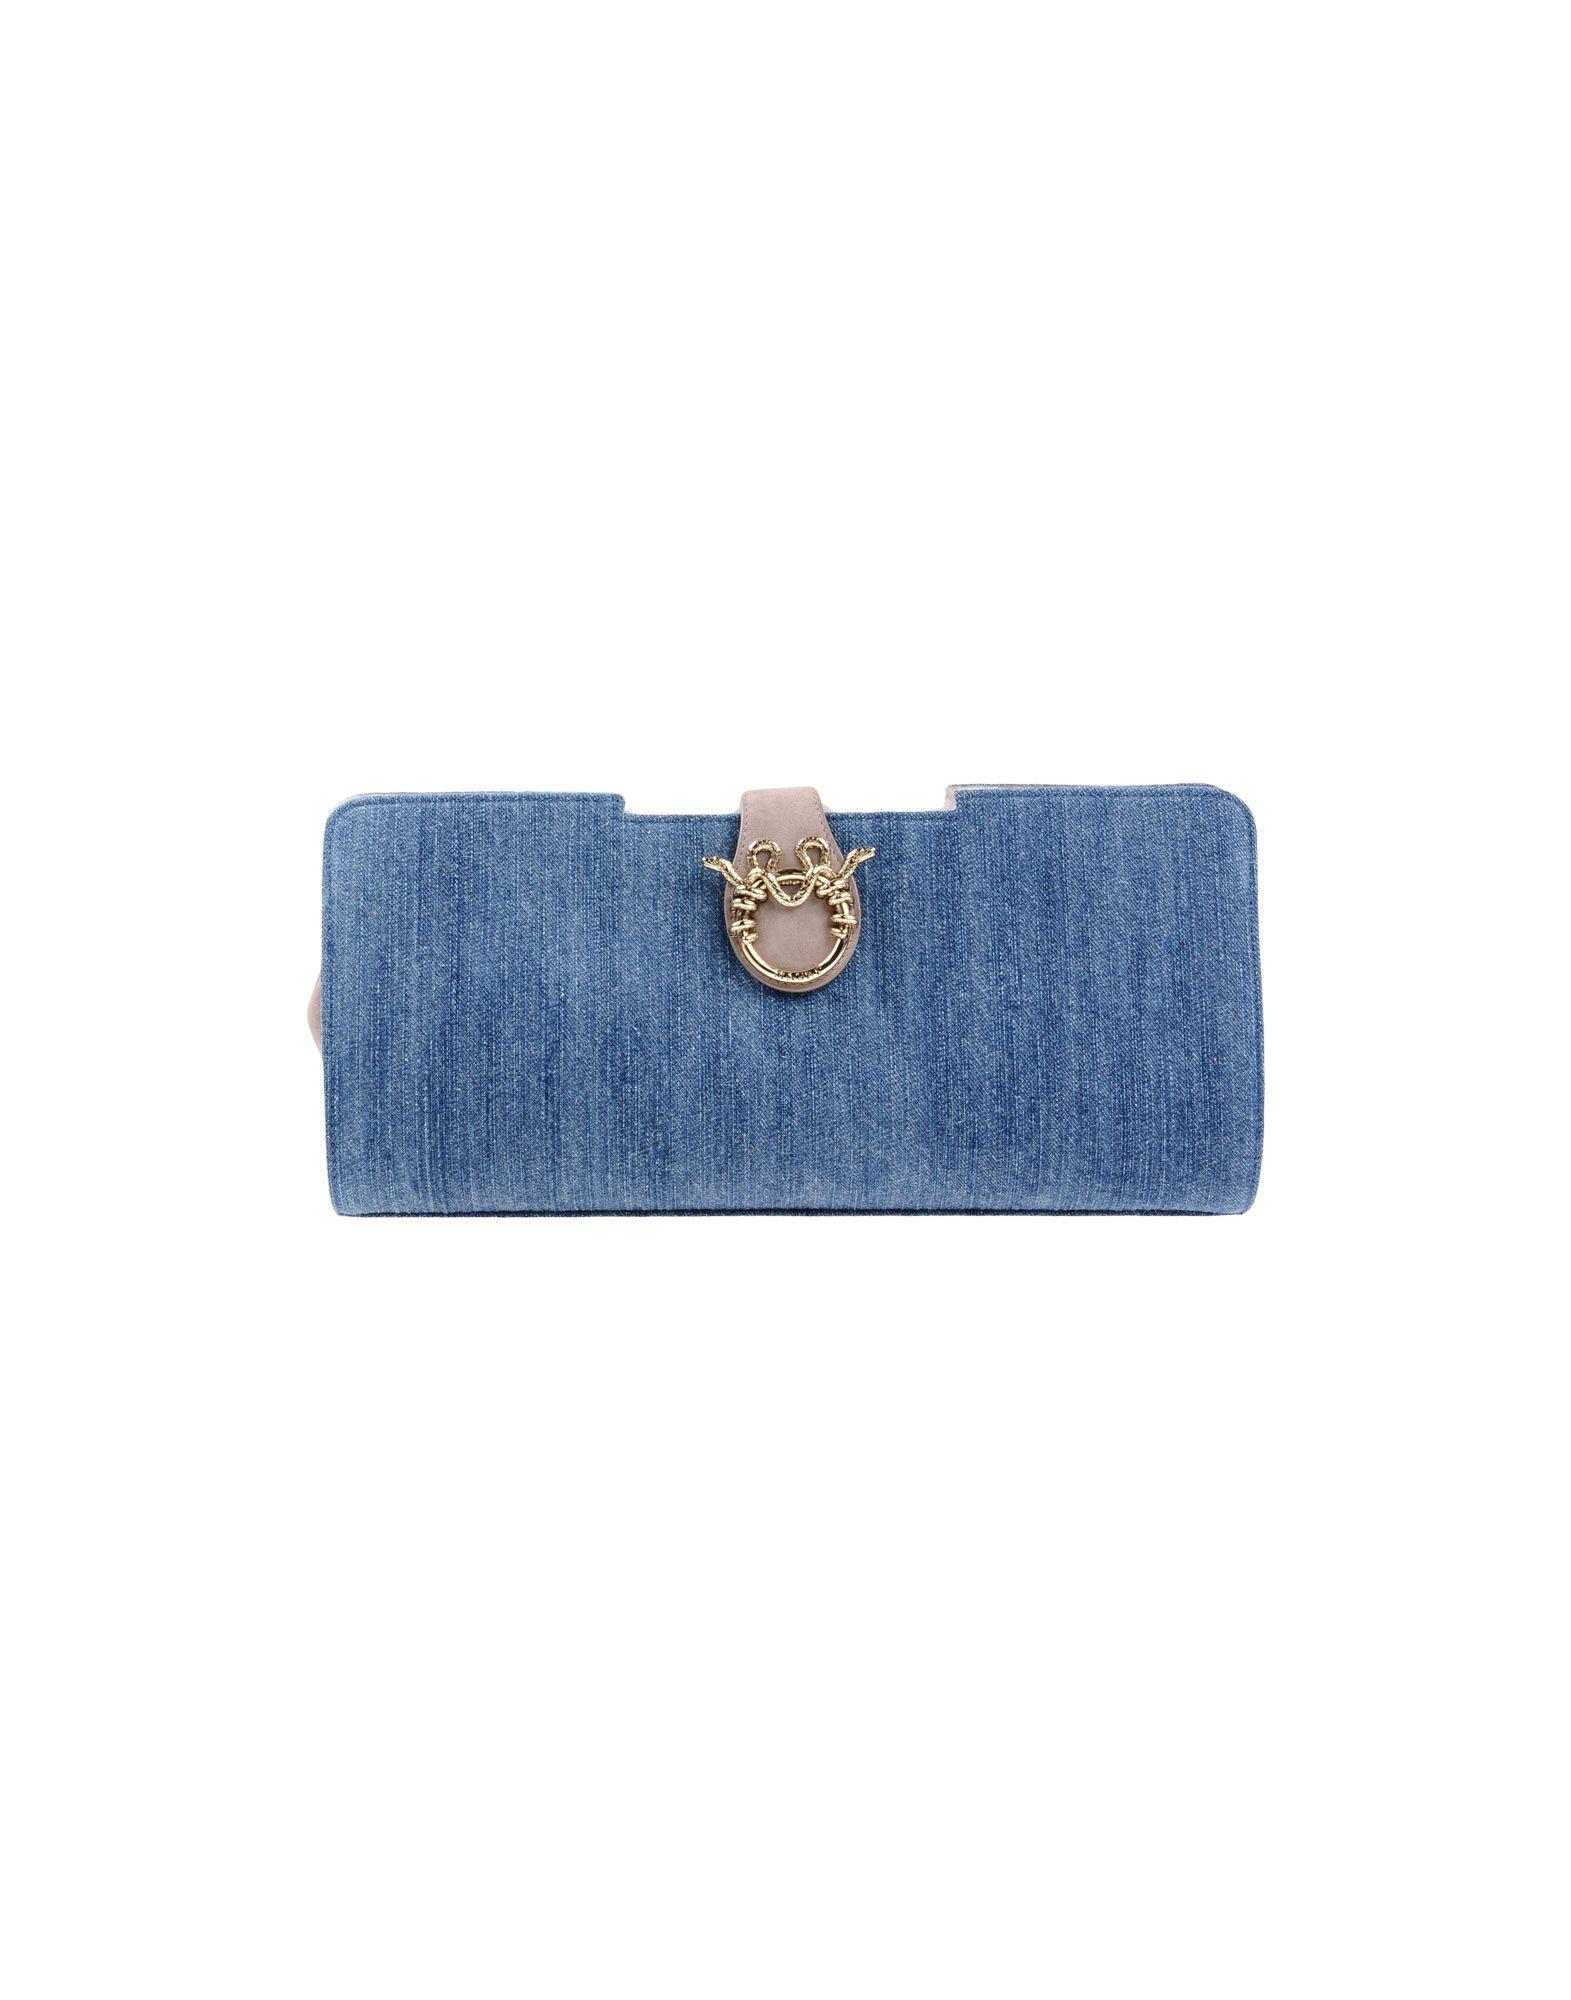 MAGRÌ Сумка на руку сумка морская хлопок джинсовая ткань ручная авторская работа velvet april россия 2014 год